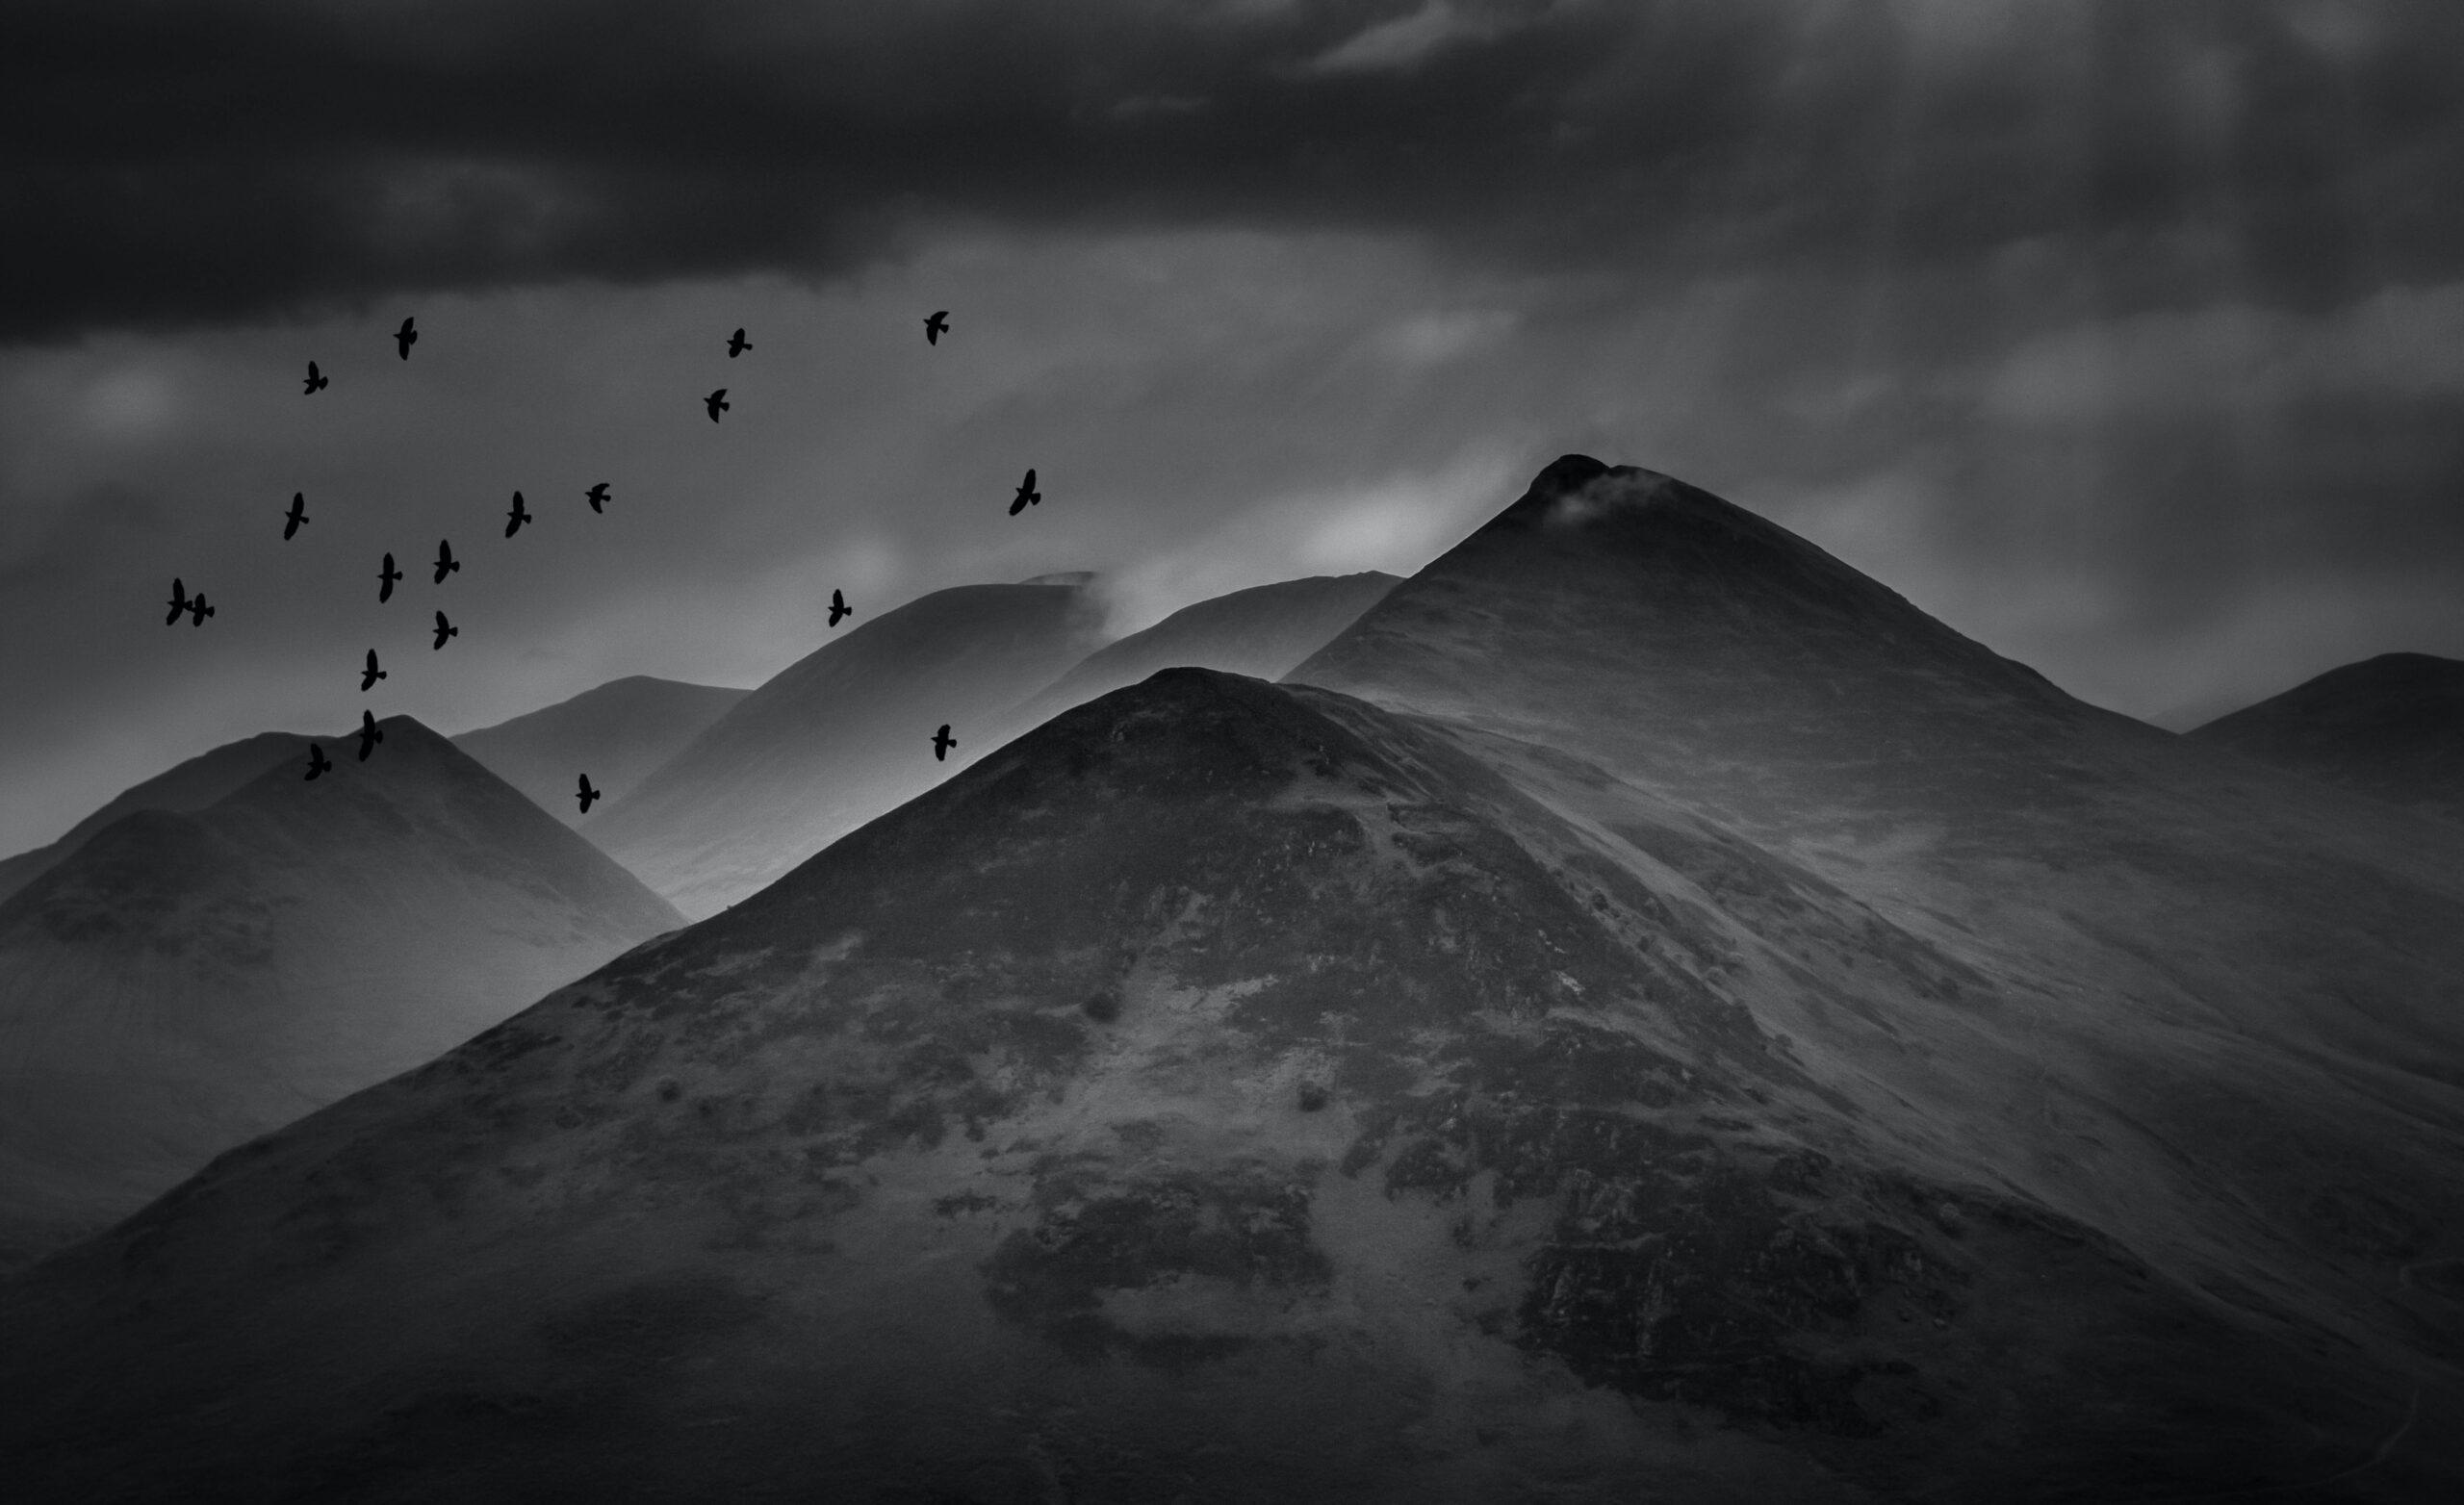 Mountains of Wales photo by Jordan Stimpson on Unsplash